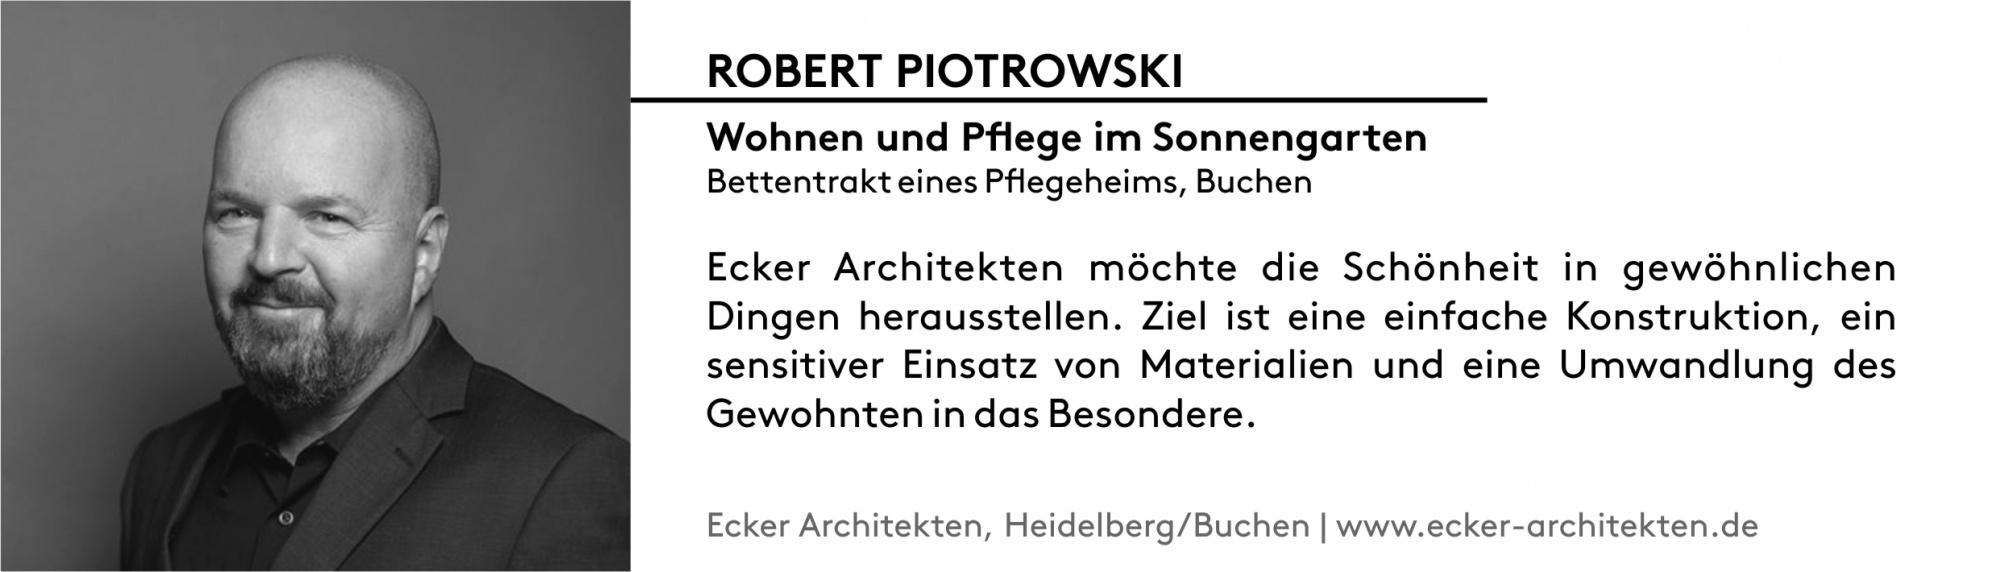 Robert Piotrowski